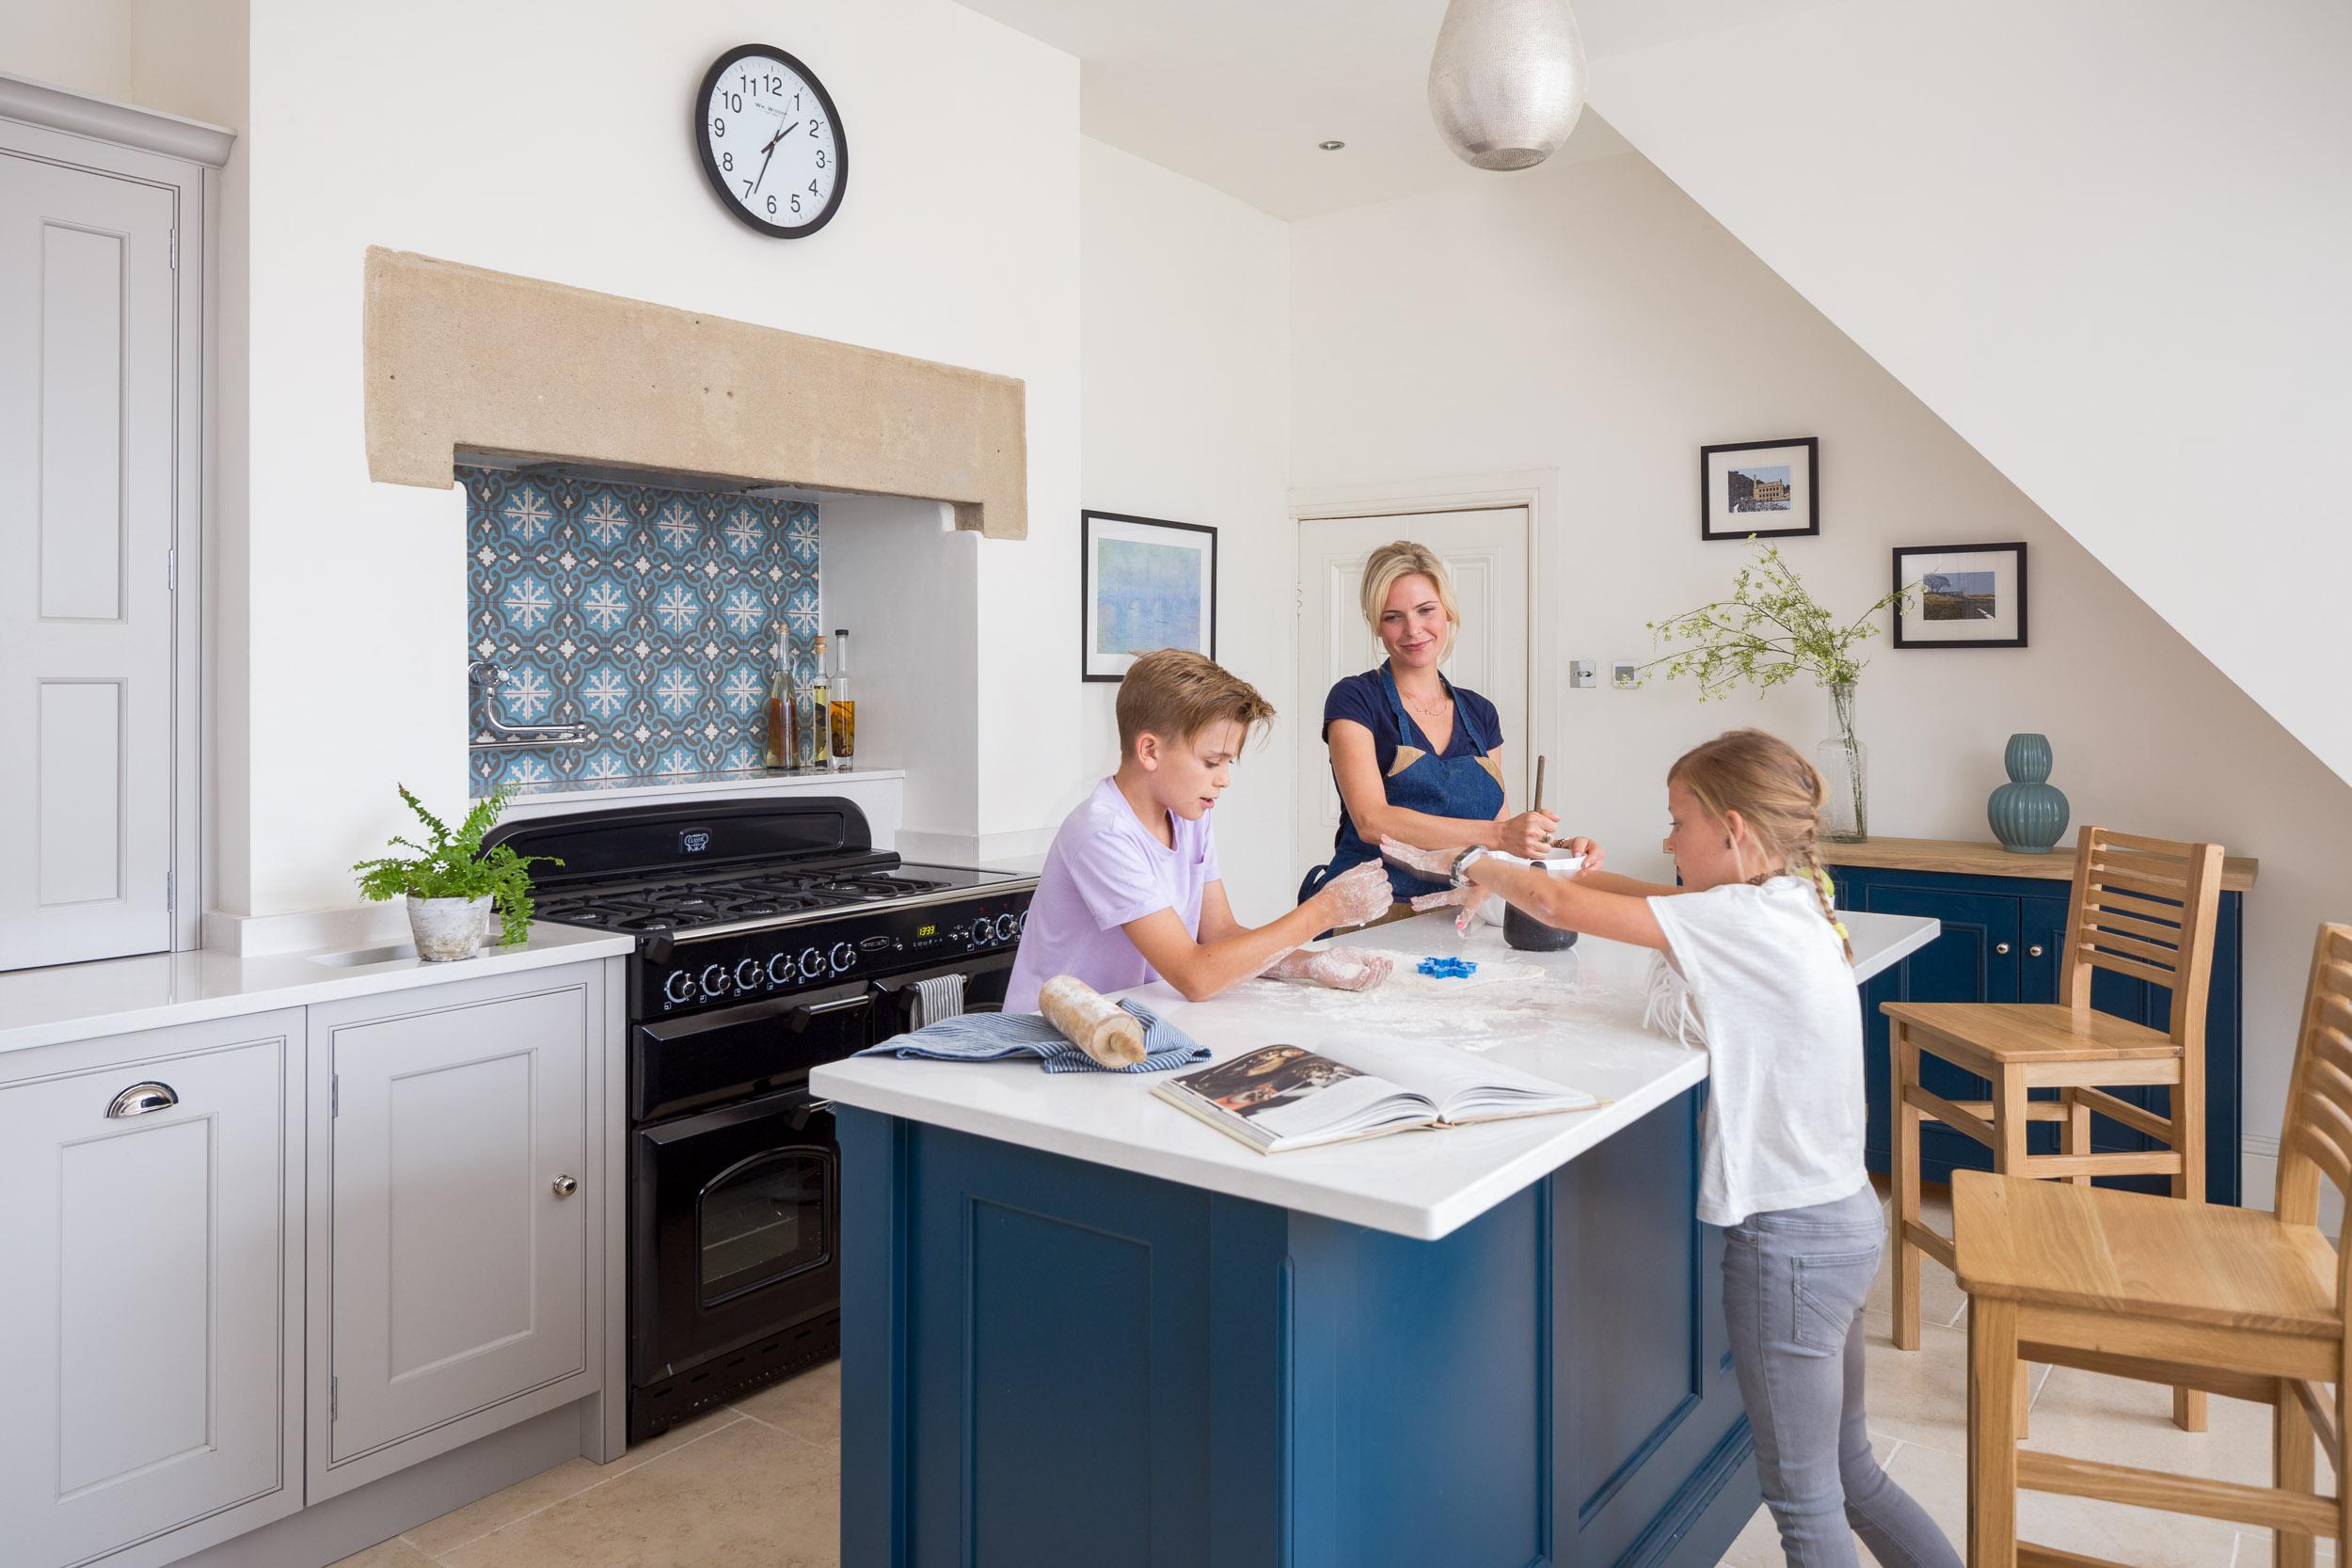 handmade custom bespoke kitchen interior lifestyle children baking with mother.jpg